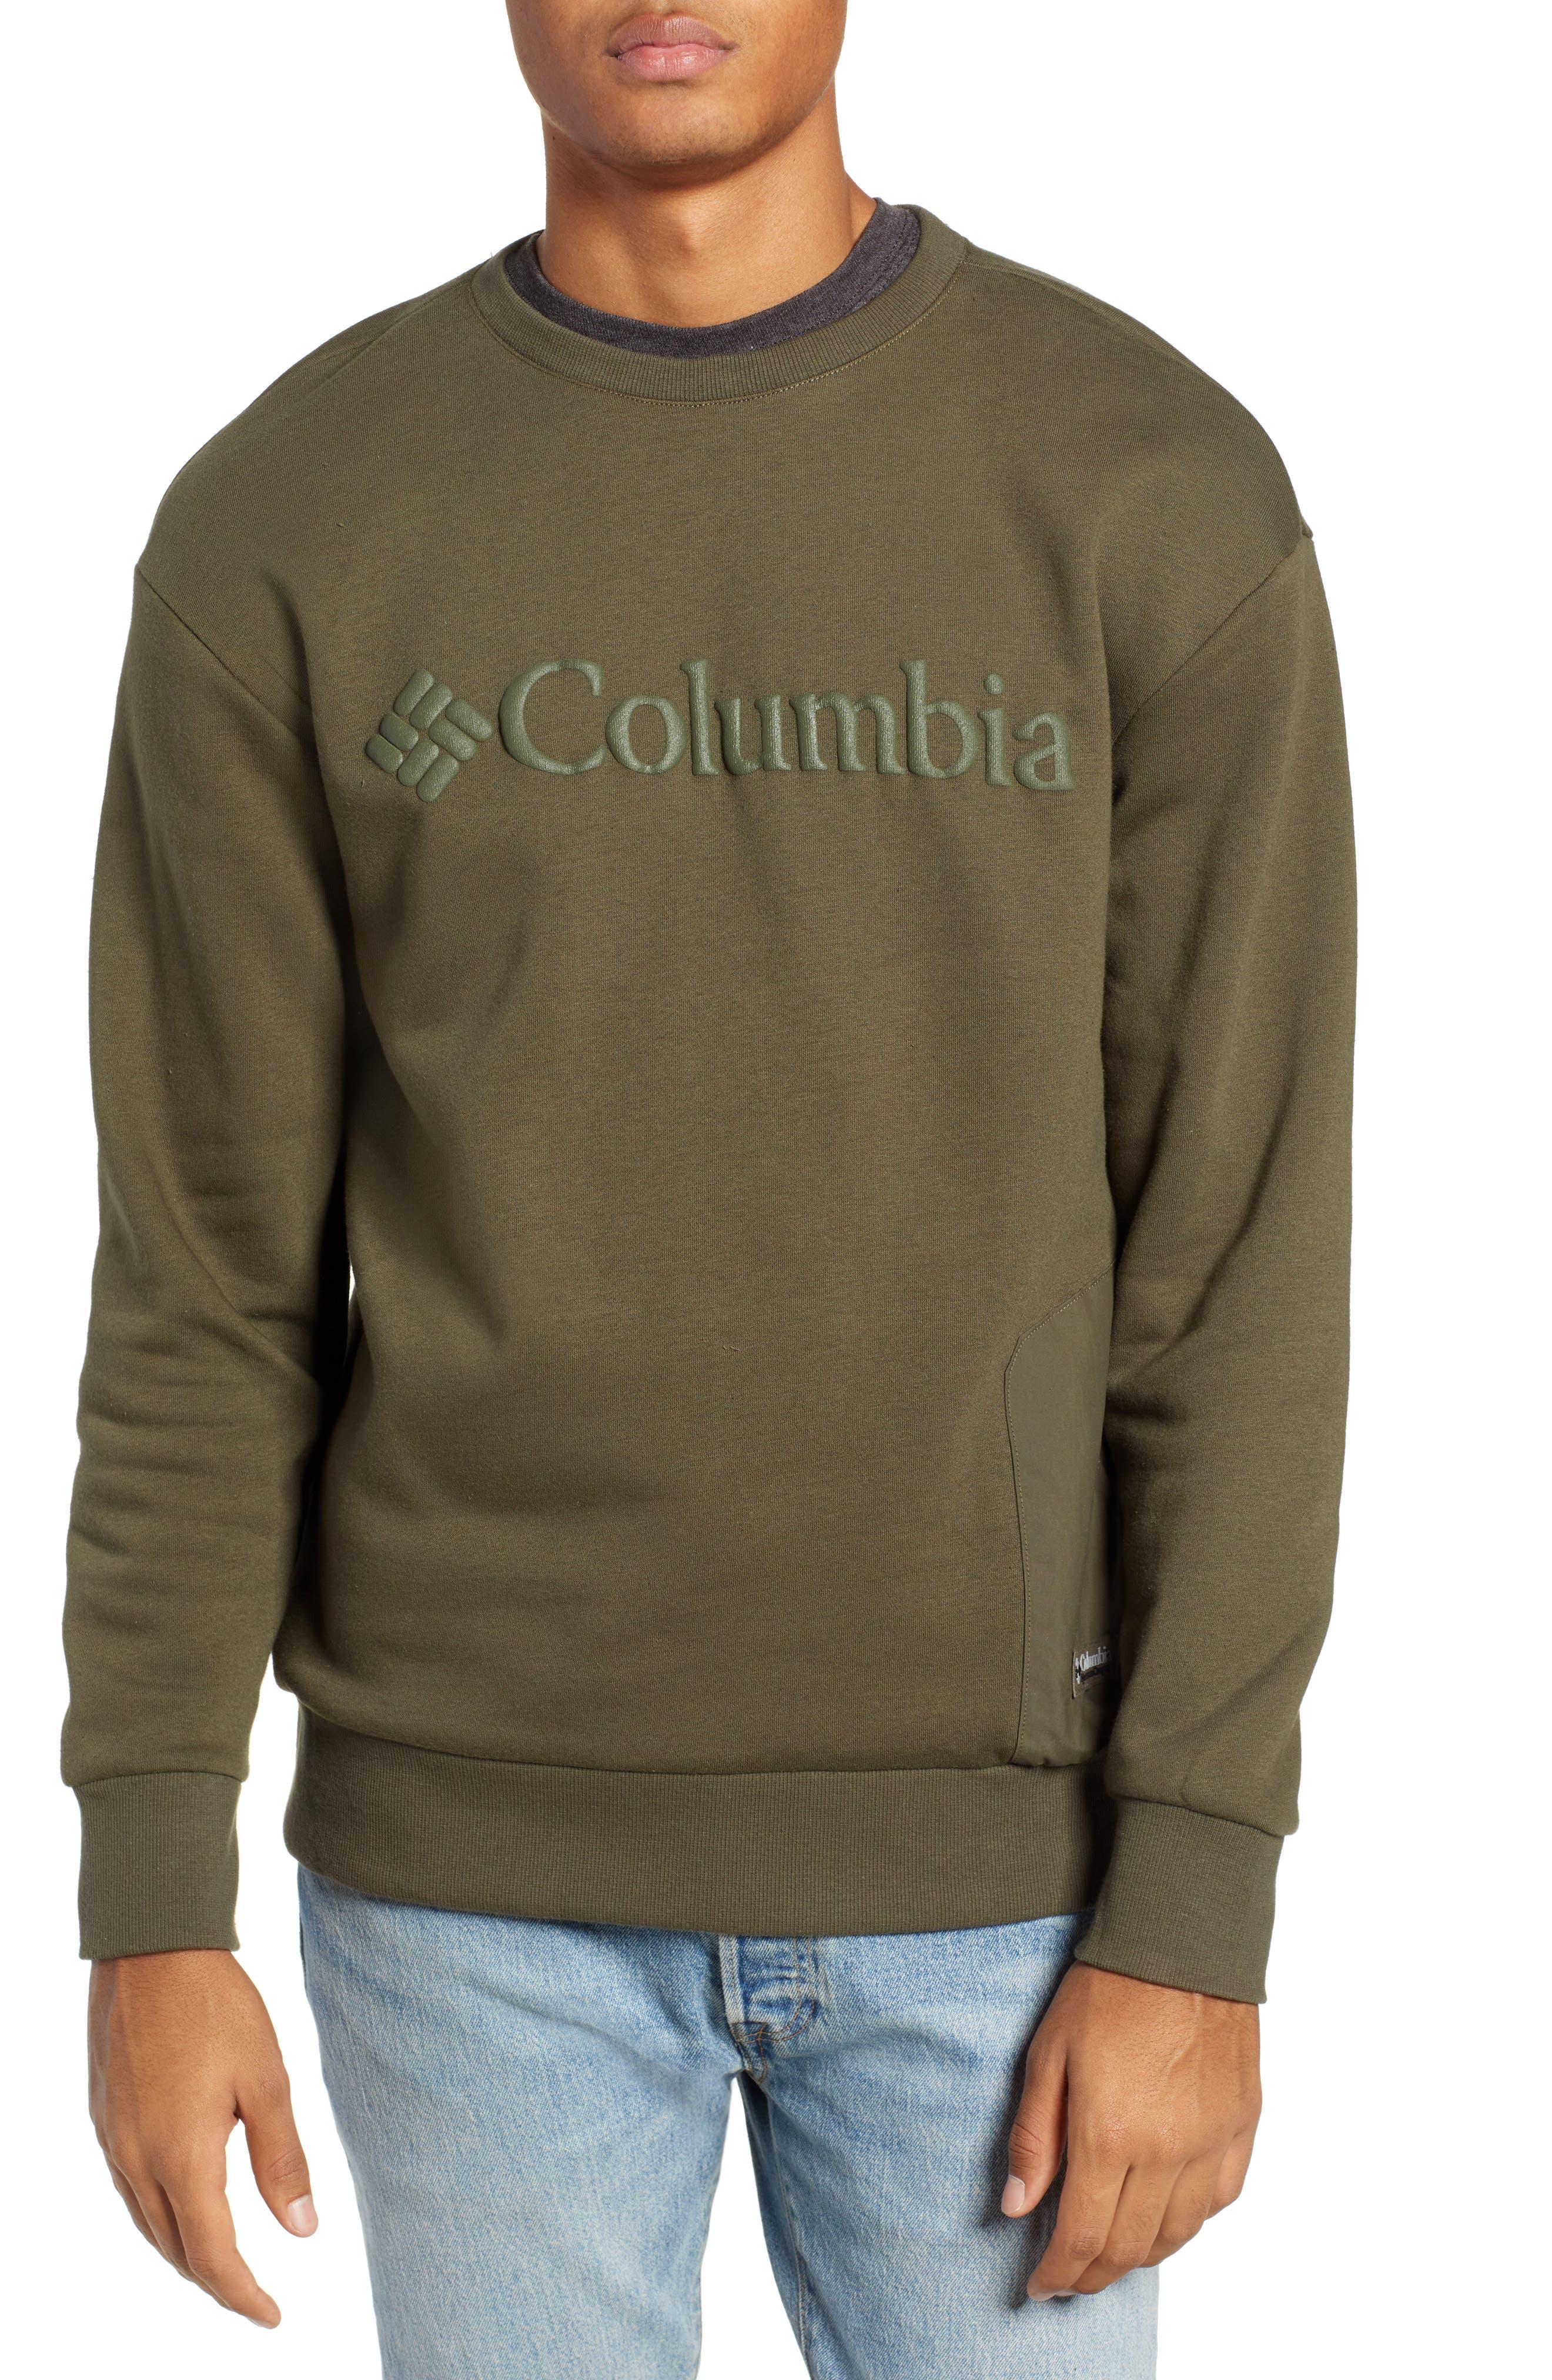 Bugasweat Crewneck Sweatshirt,                             Main thumbnail 1, color,                             PEATMOSS